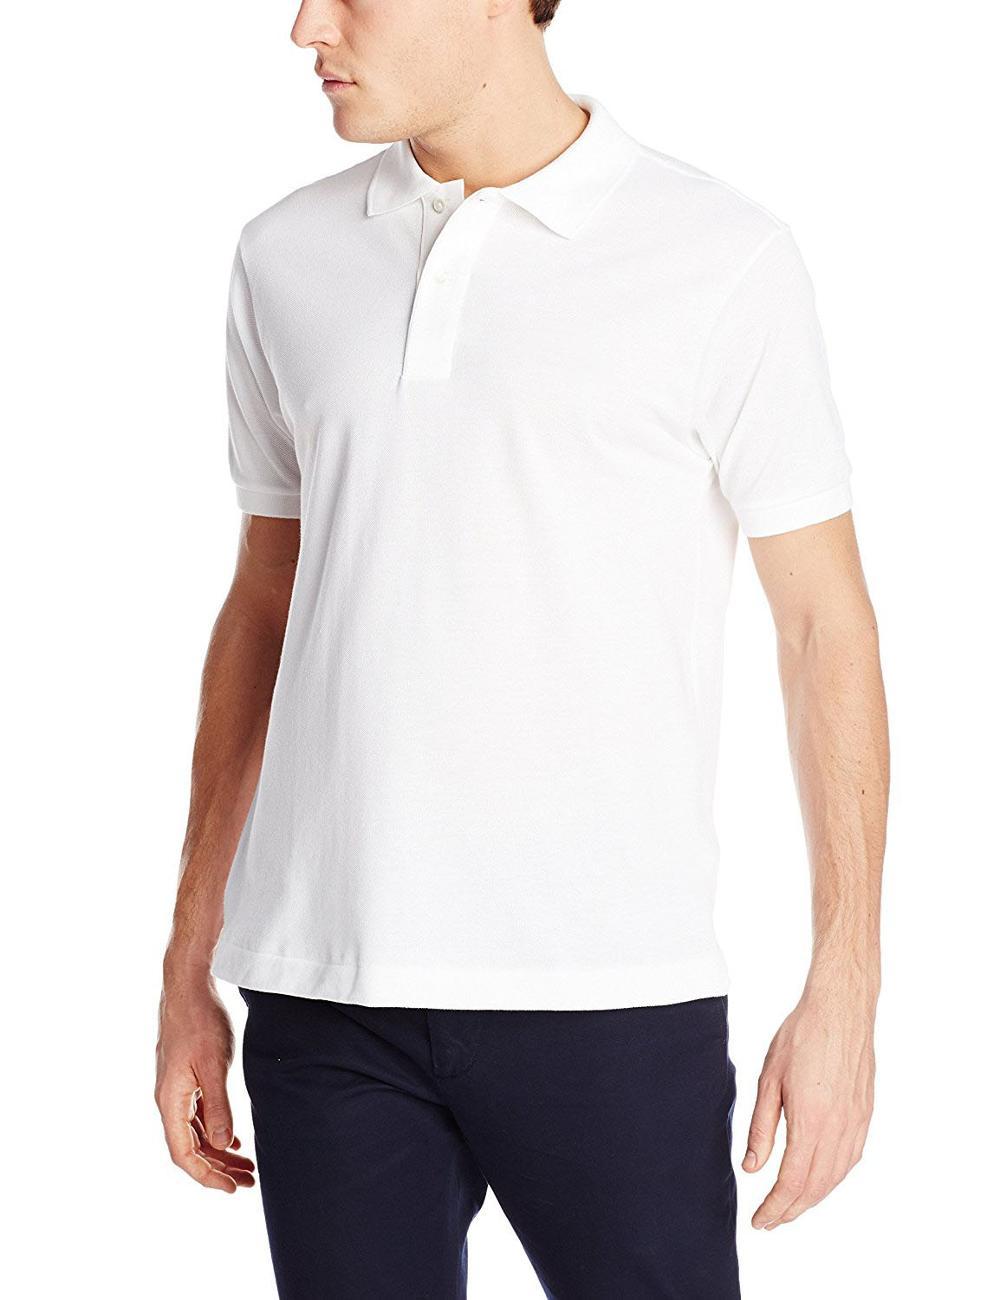 Plain Polo Shirts Wholesale Bcd Tofu House